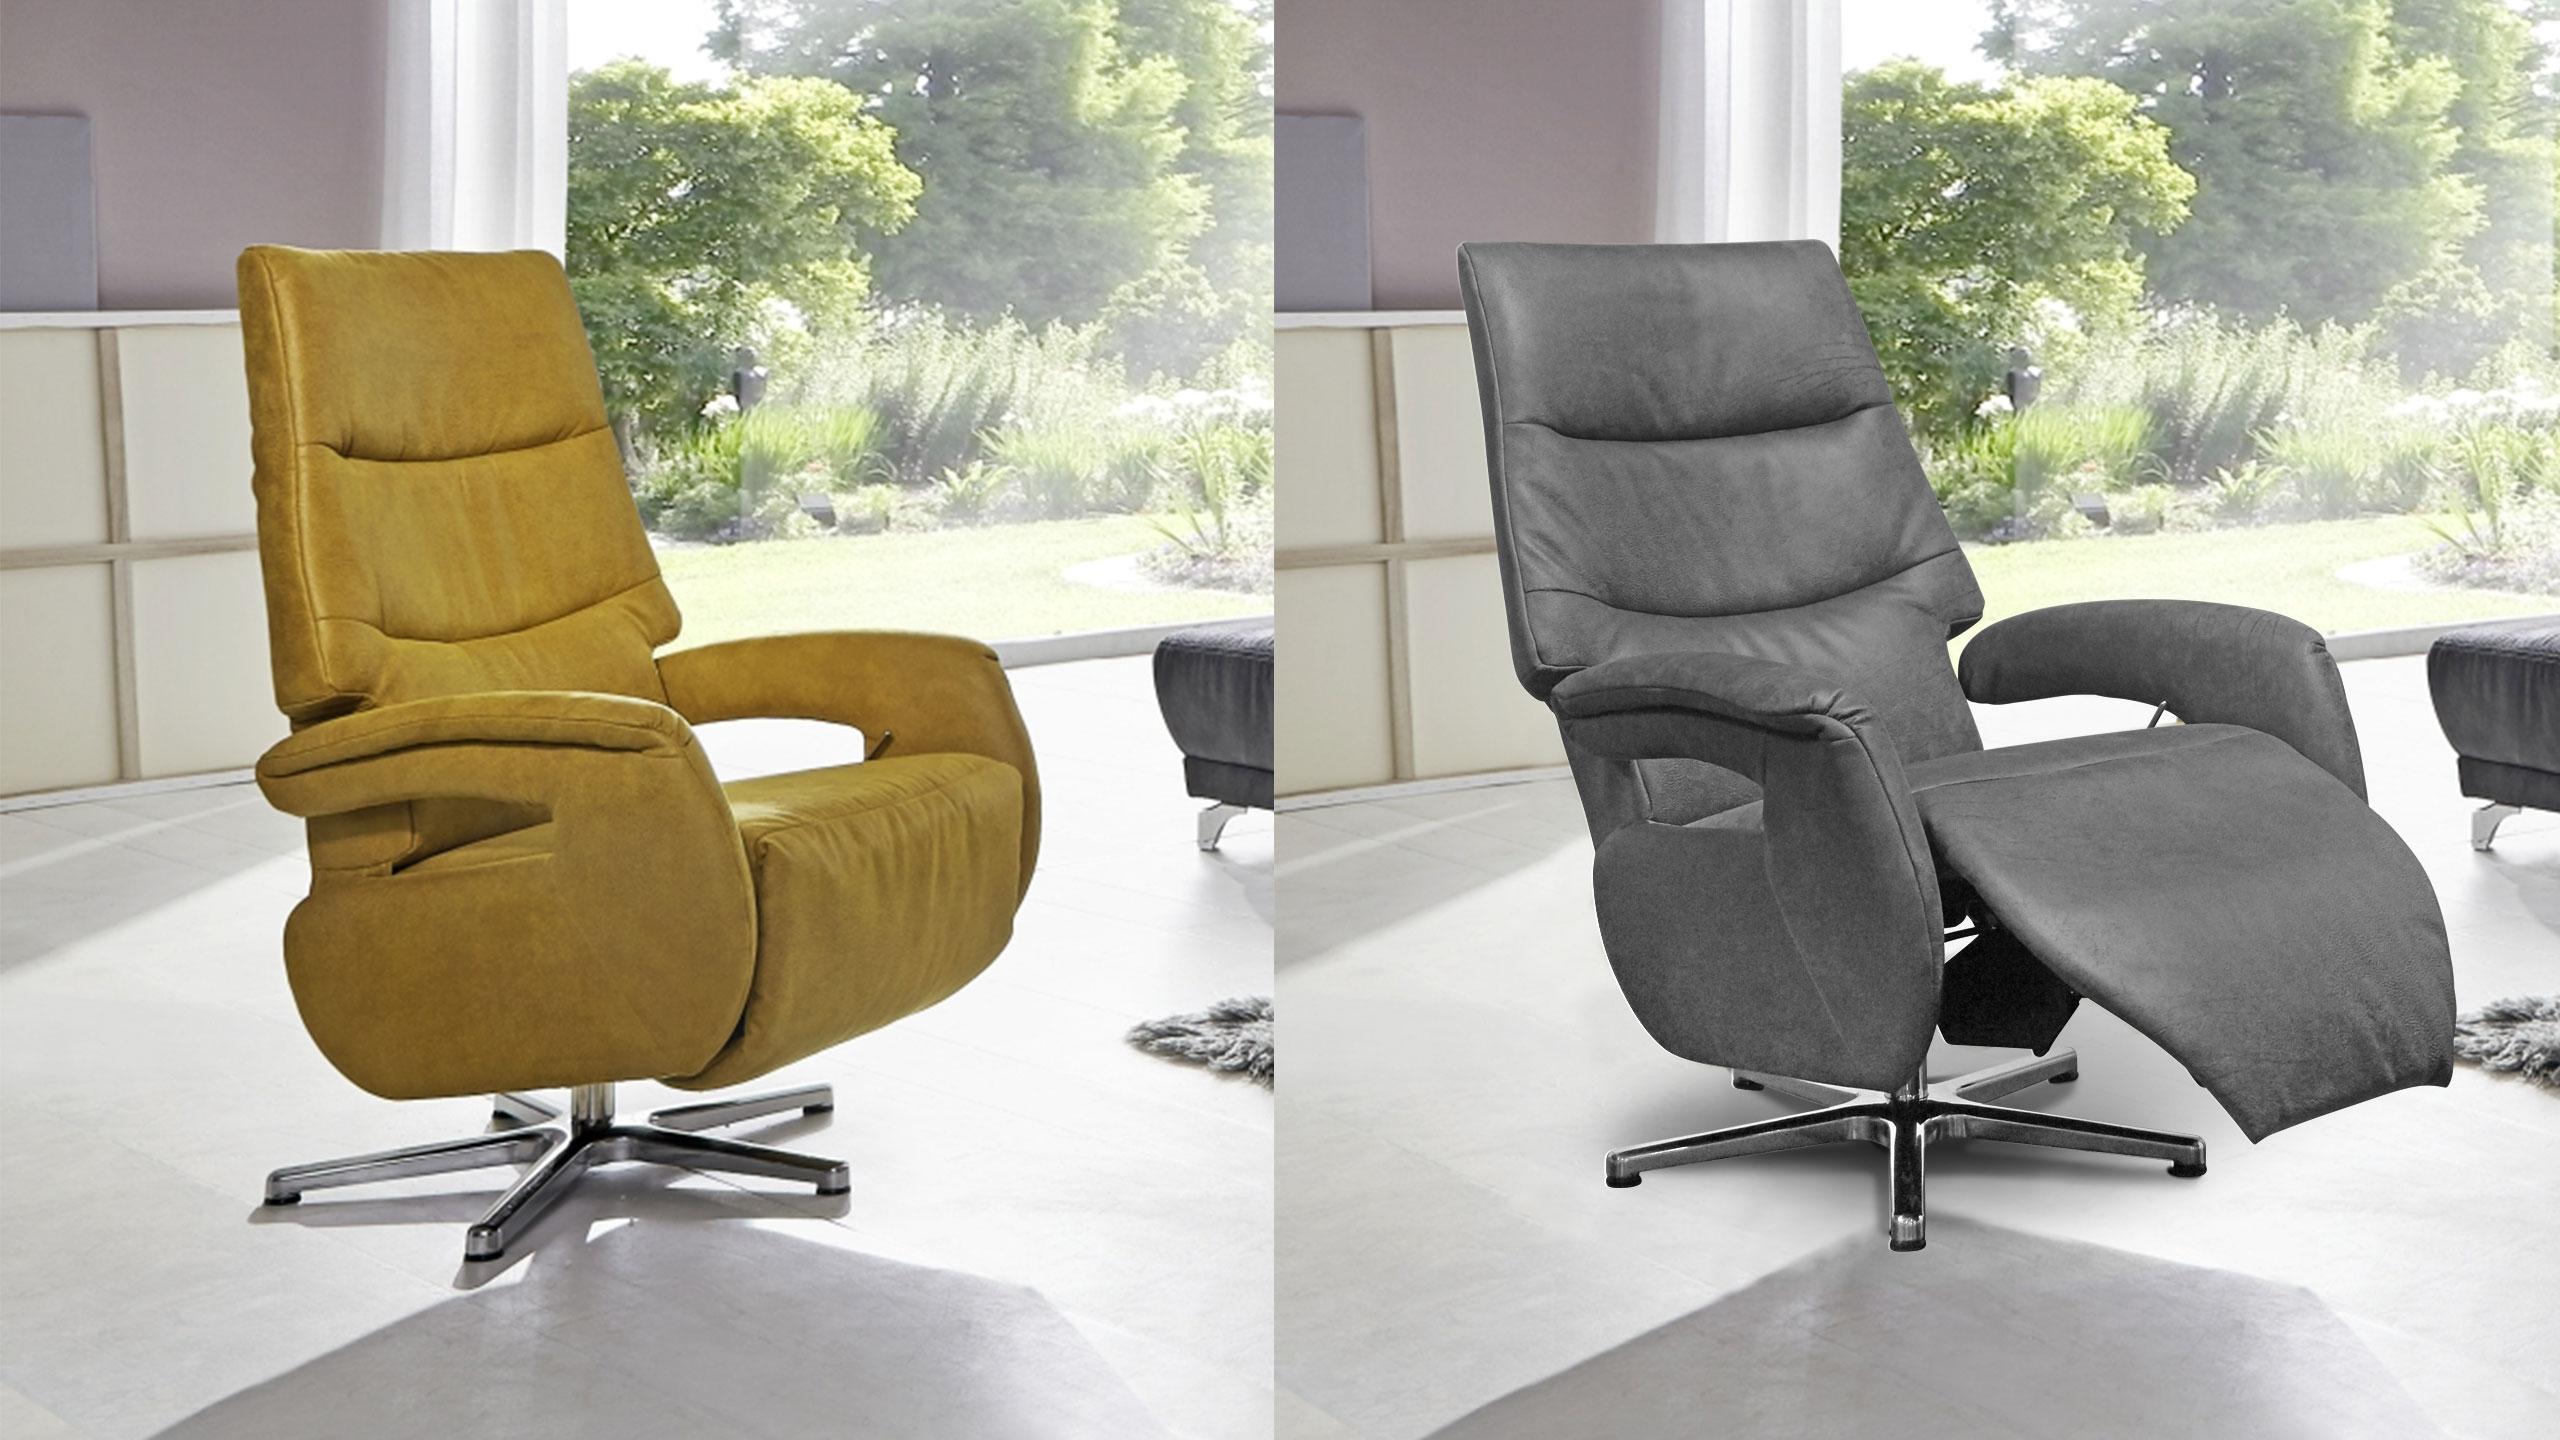 Full Size of Liegesessel Verstellbar Unostyle Sessel Multipolster Sofa Mit Verstellbarer Sitztiefe Wohnzimmer Liegesessel Verstellbar